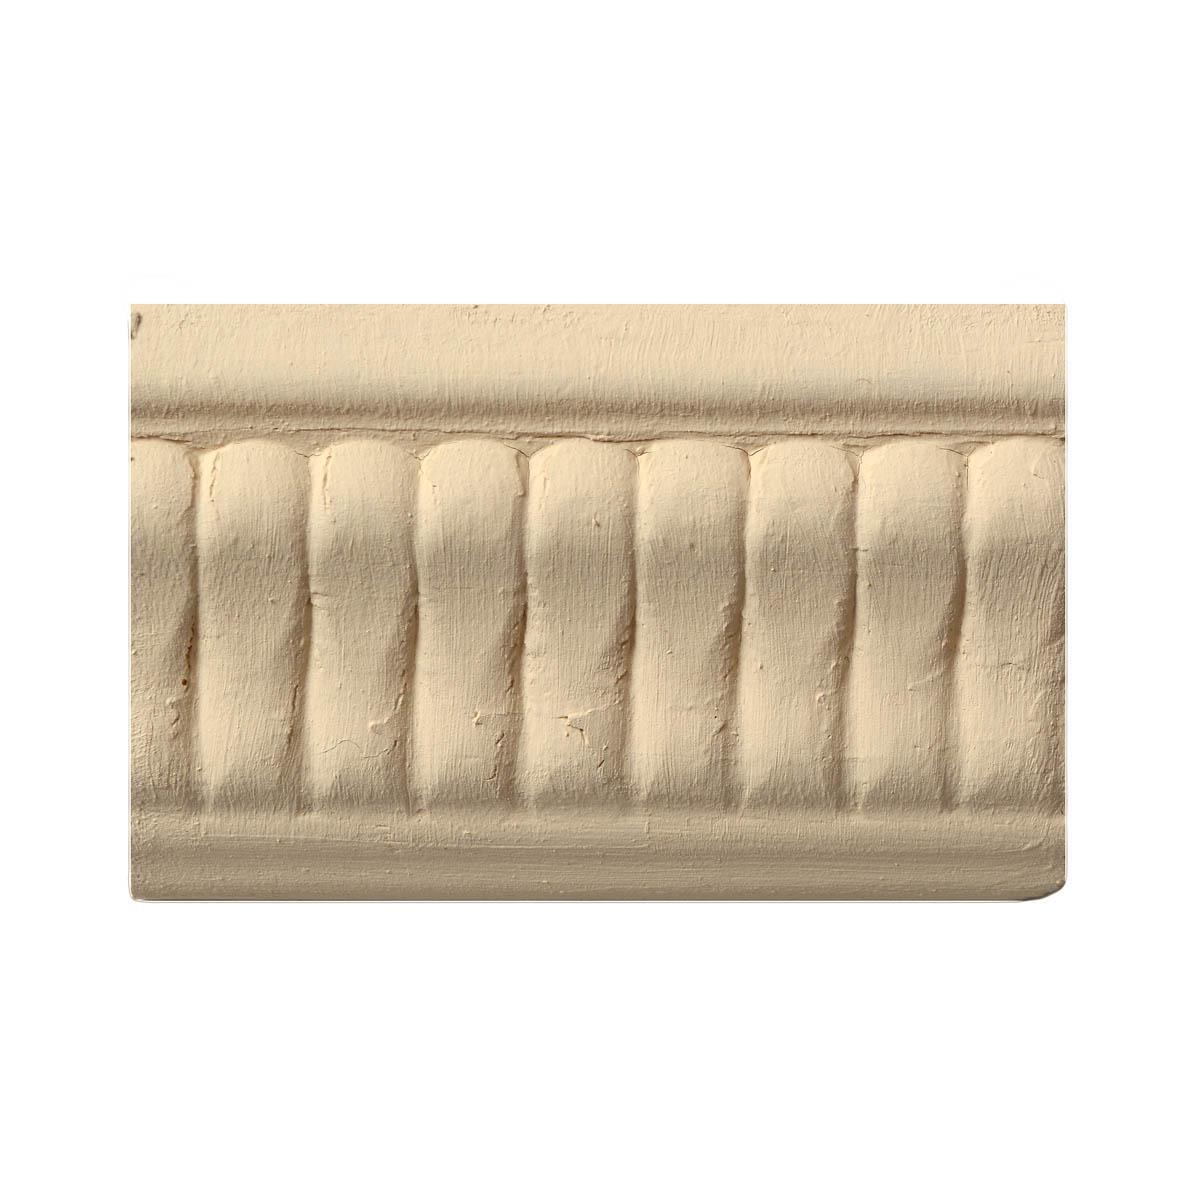 Waverly ® Inspirations Chalk Finish Acrylic Paint - Cashew, 16 oz. - 60747E